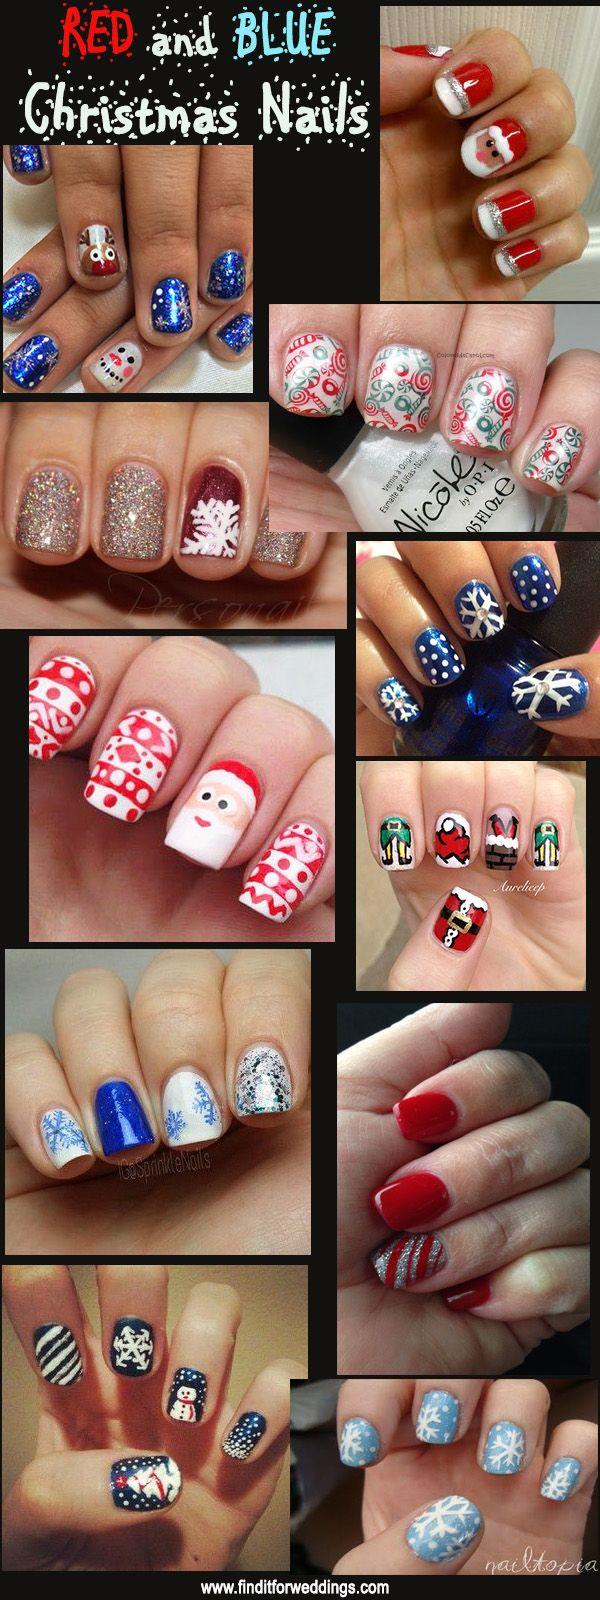 Christmas-Nails-www.finditforweddings.com-Nail-Art-Design-Red-Nails-Blue-Nails.jpg 600×1,600 pixels